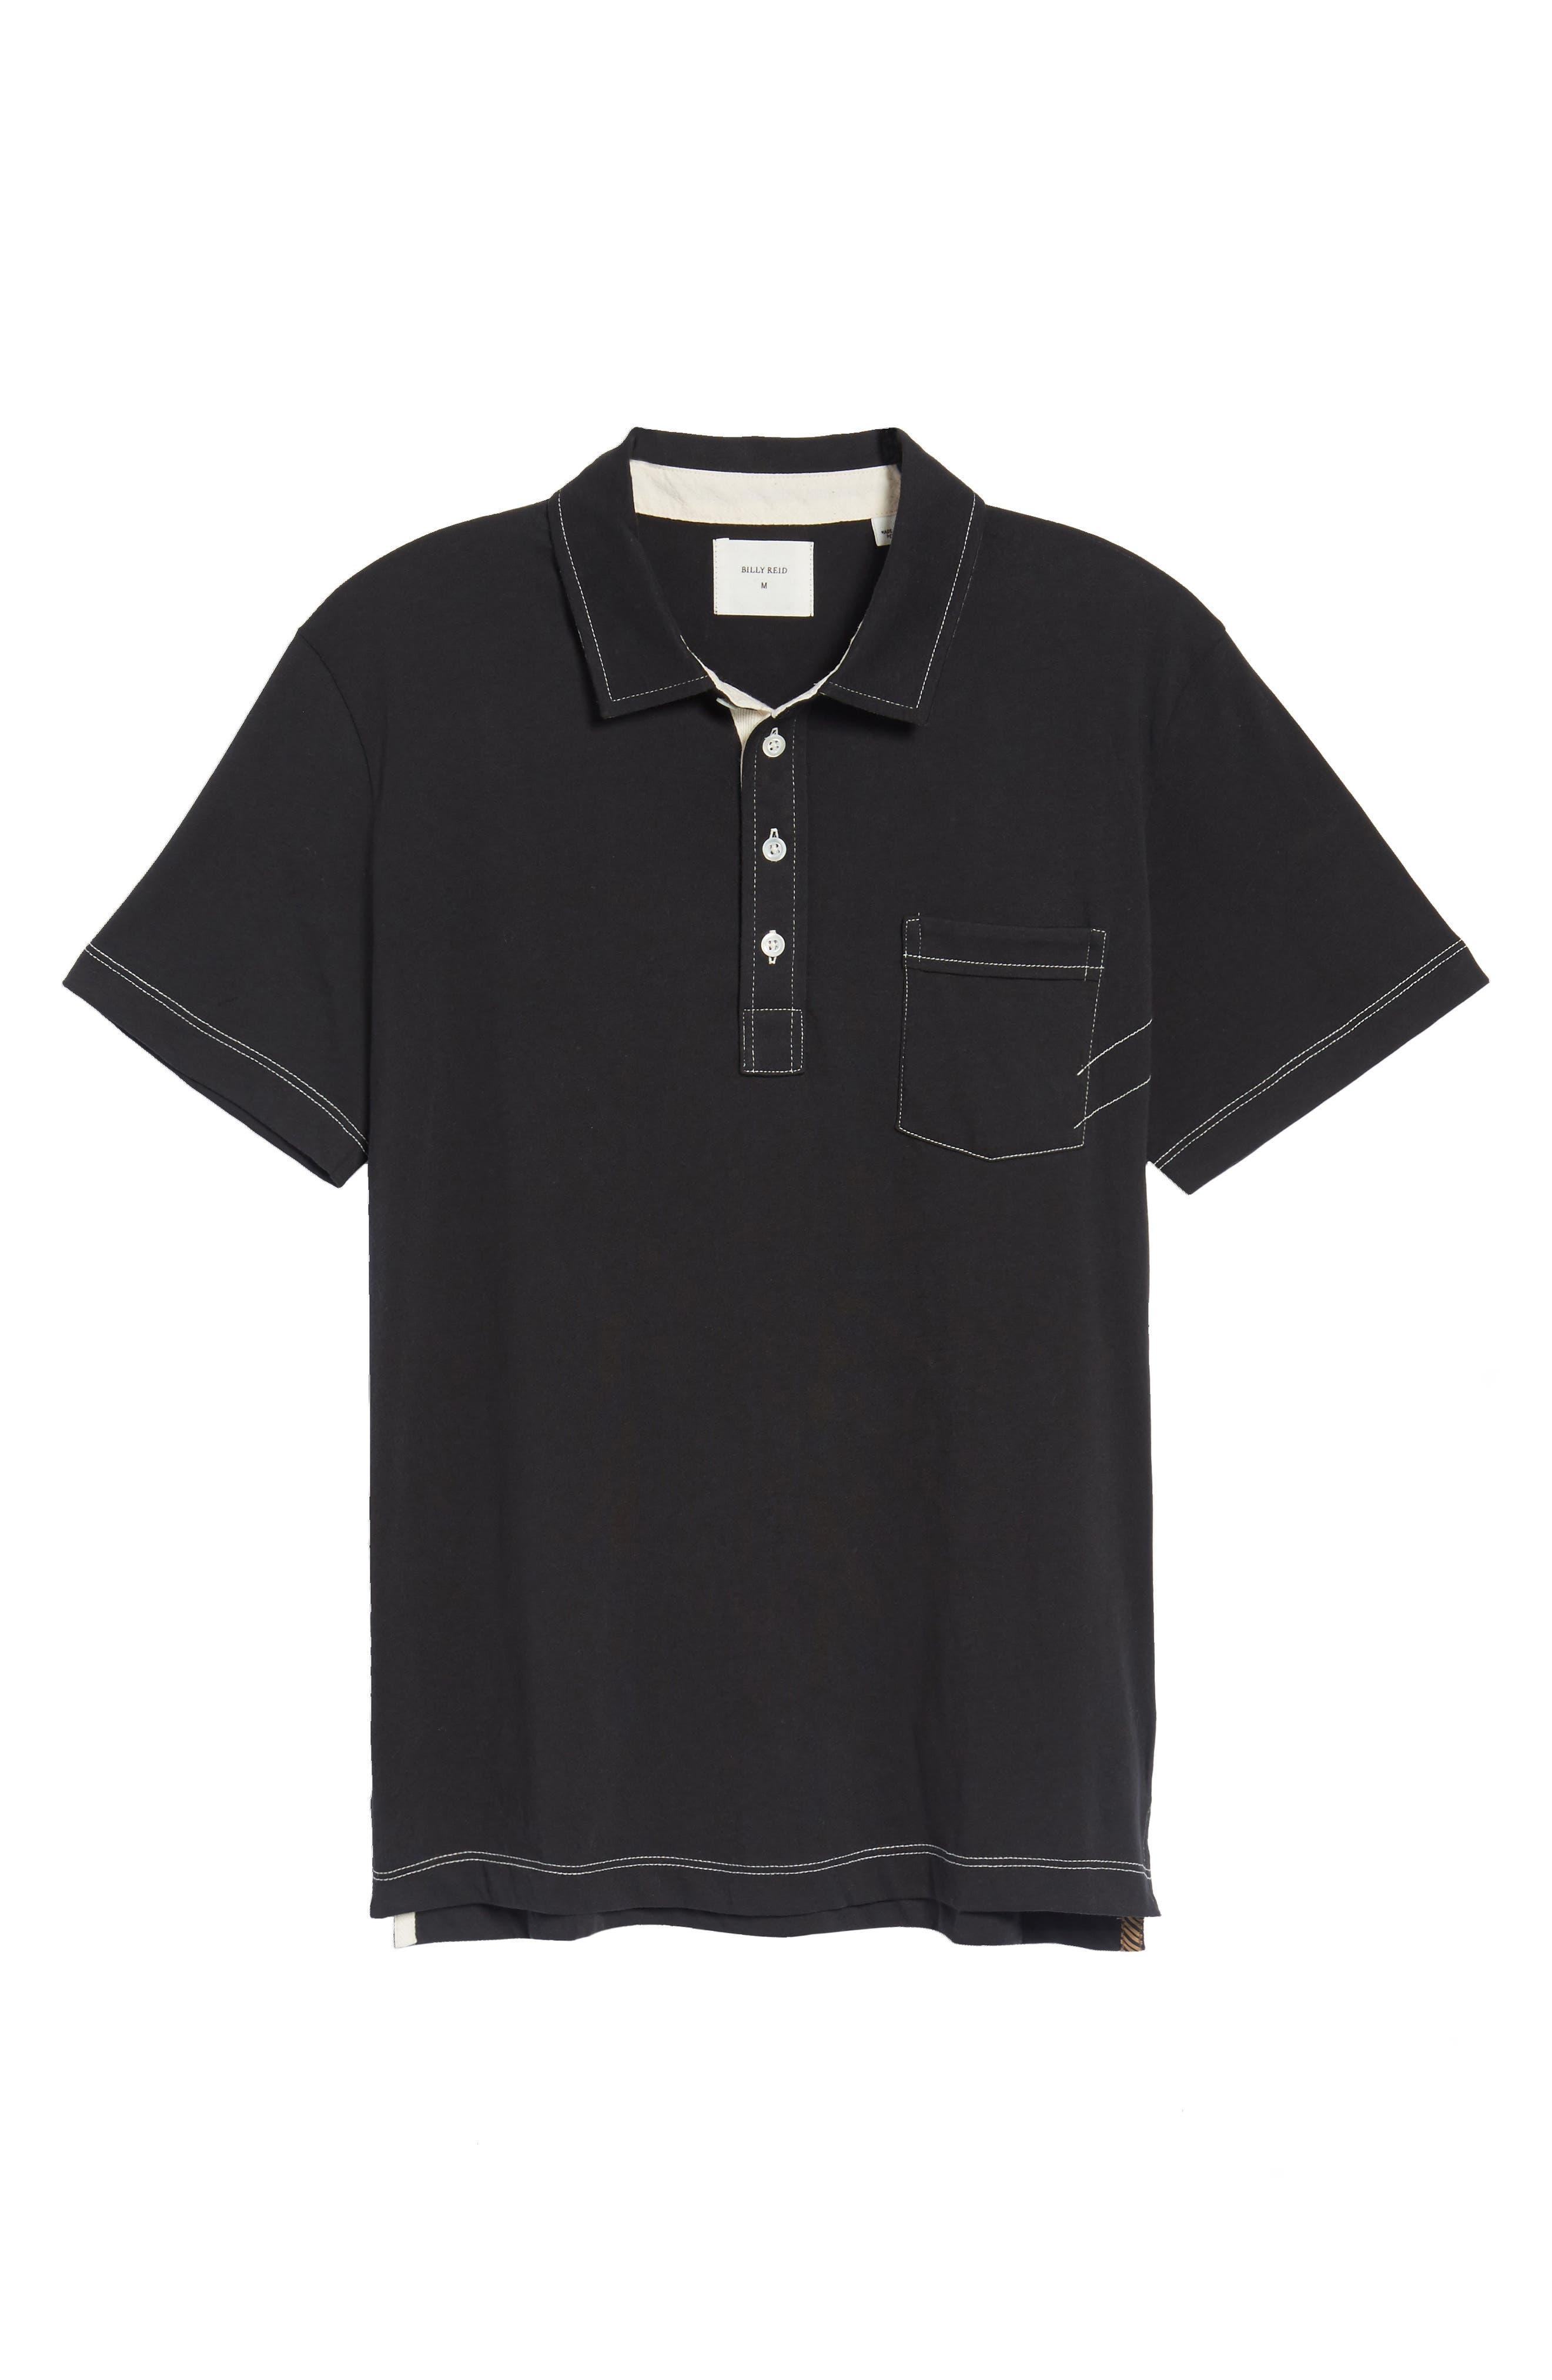 Pensacola Slim Fit Polo,                             Alternate thumbnail 4, color,                             001